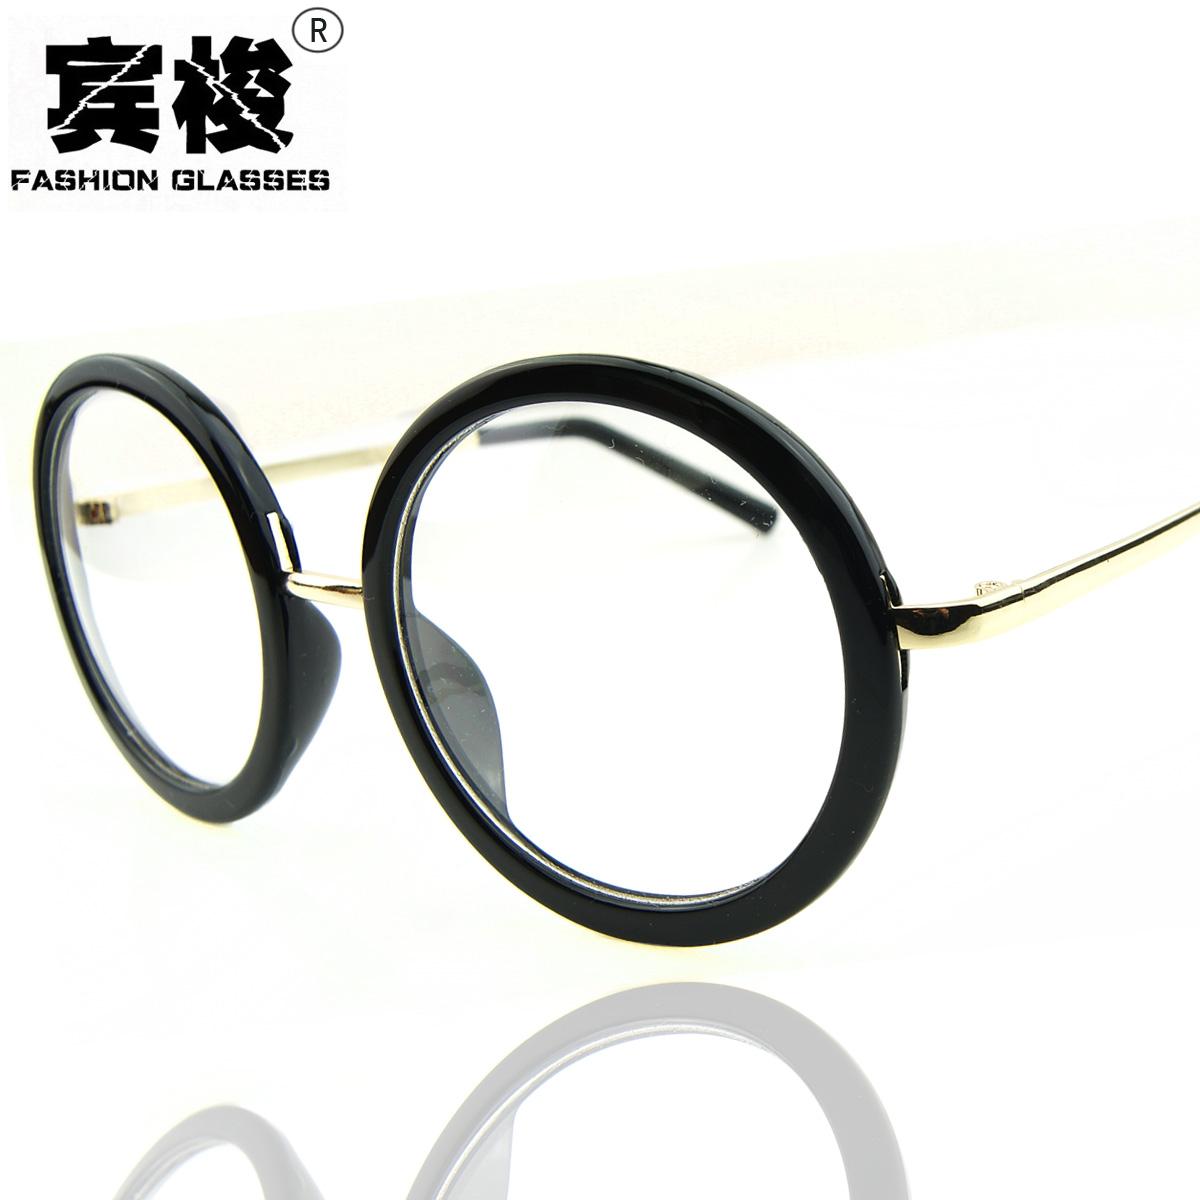 Glasses Frame Grips : Eyeglass Grips Promotion-Online Shopping for Promotional ...